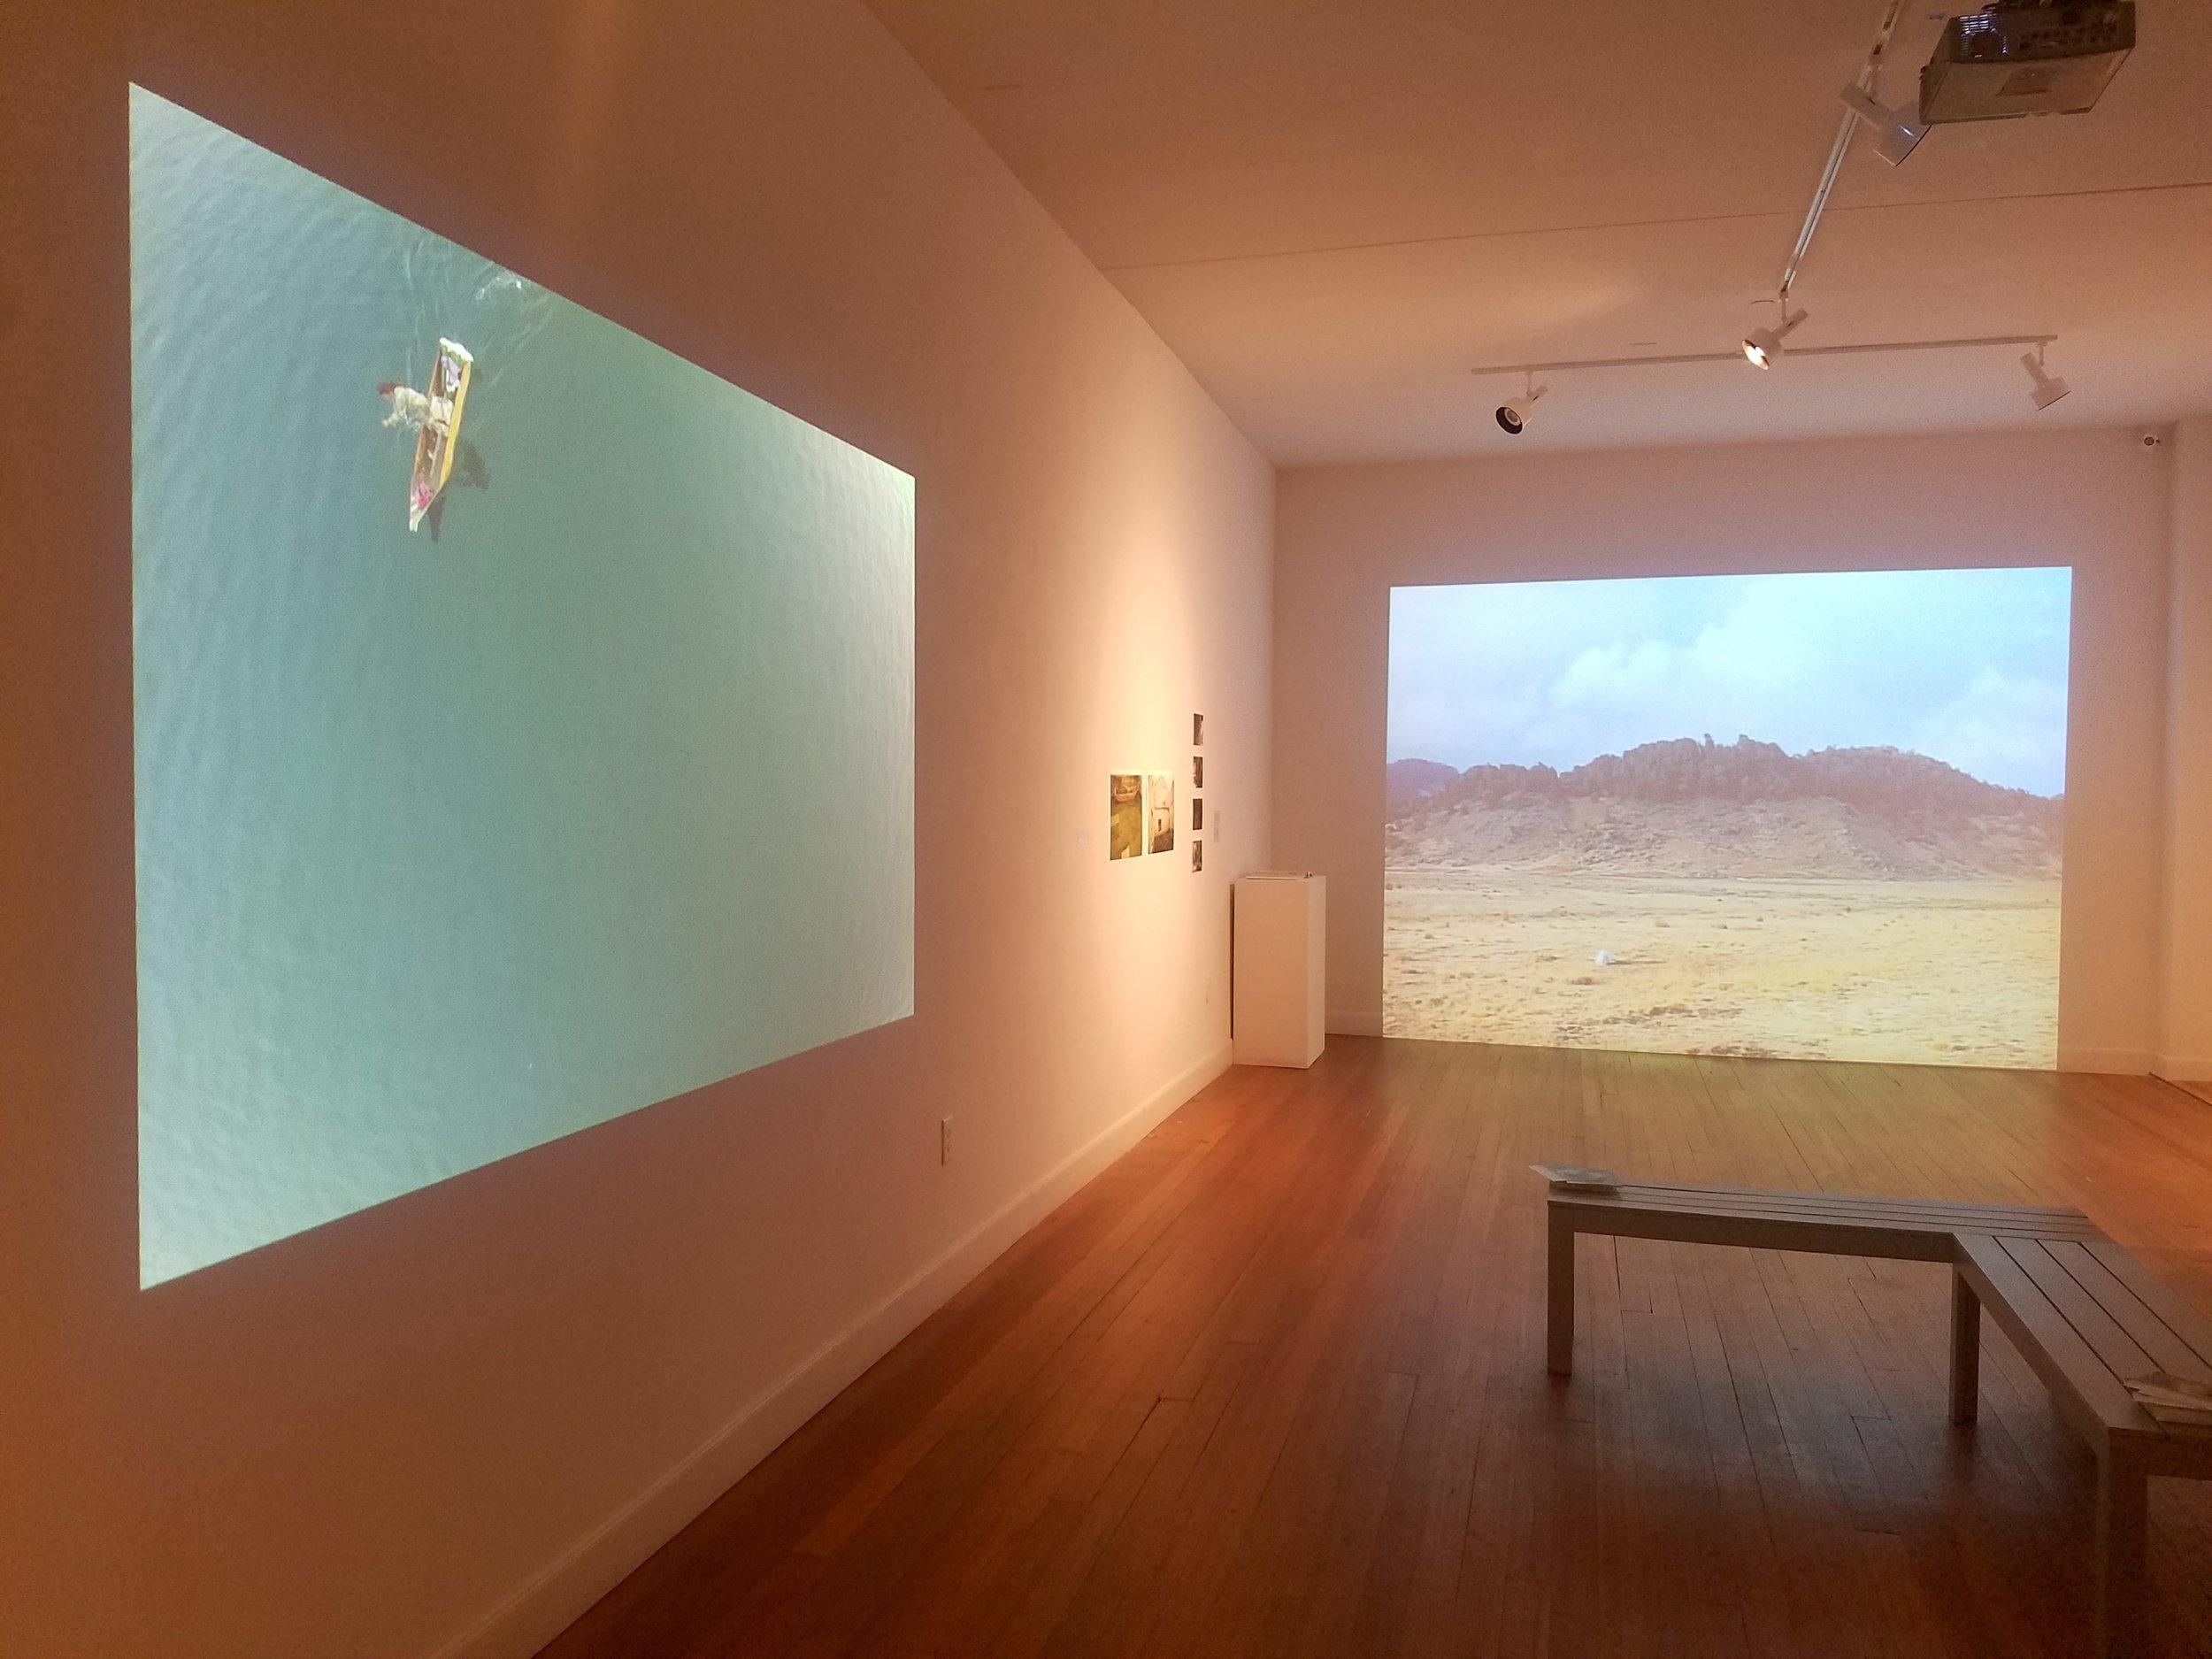 Installation view of  Una piedra y la lluvia  at Lawndale Art Center, Houston, TX. March 2017.